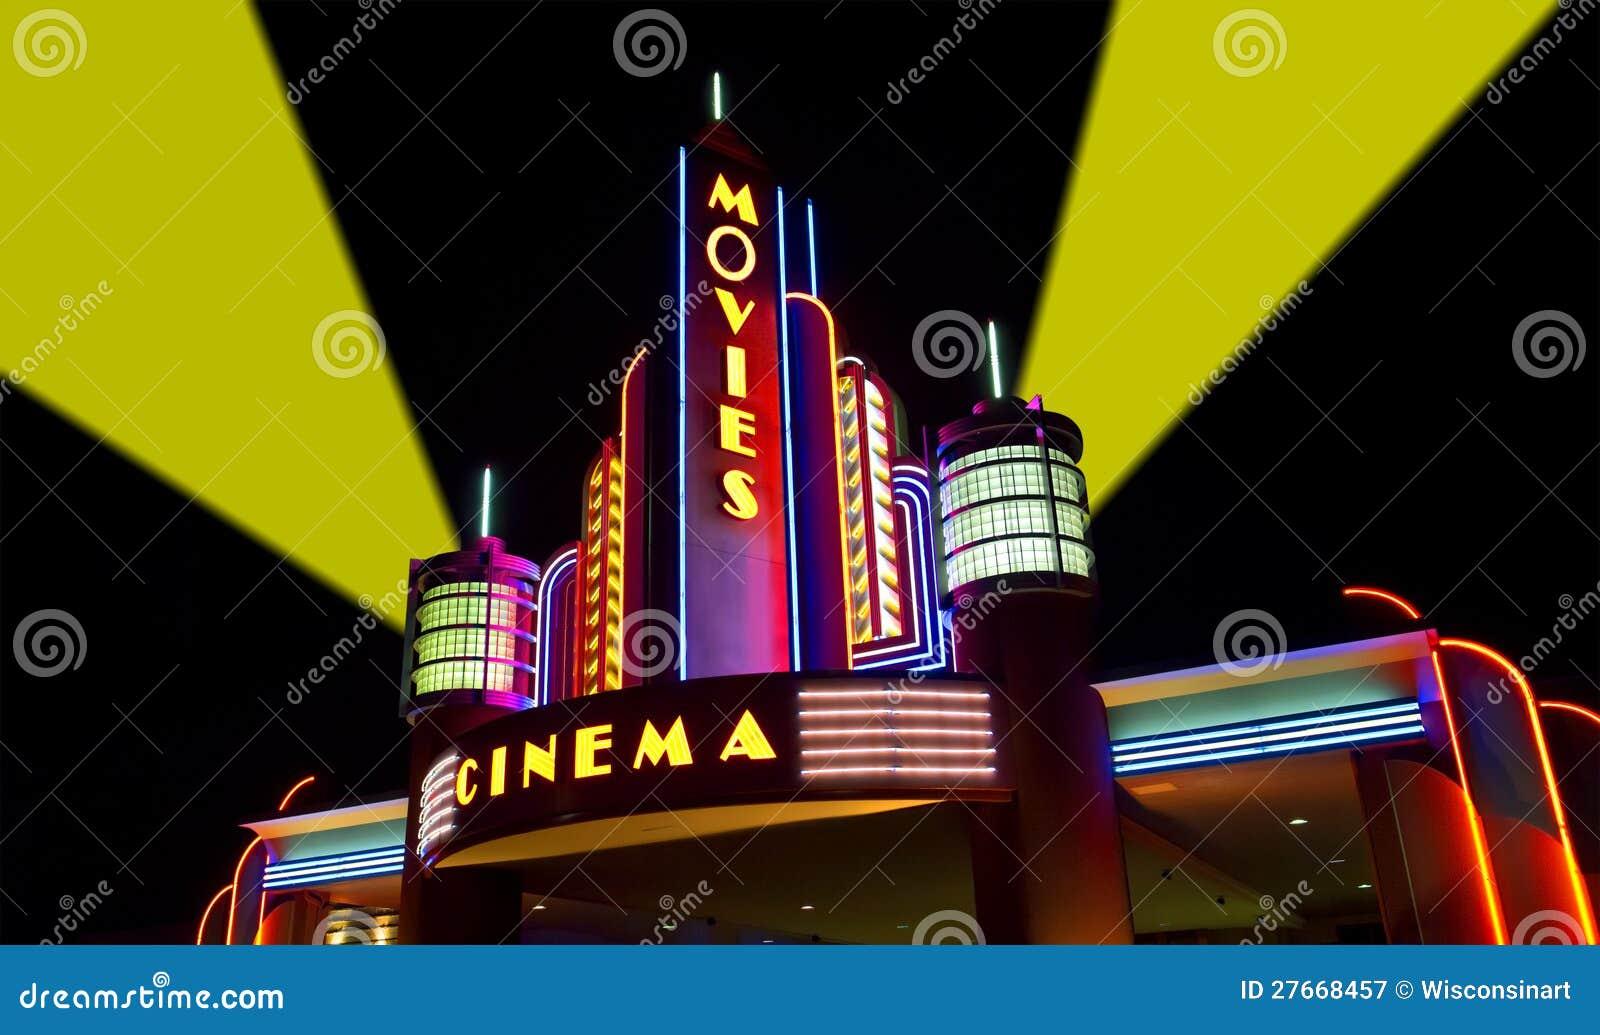 Filmy, Film, Kino, Kino